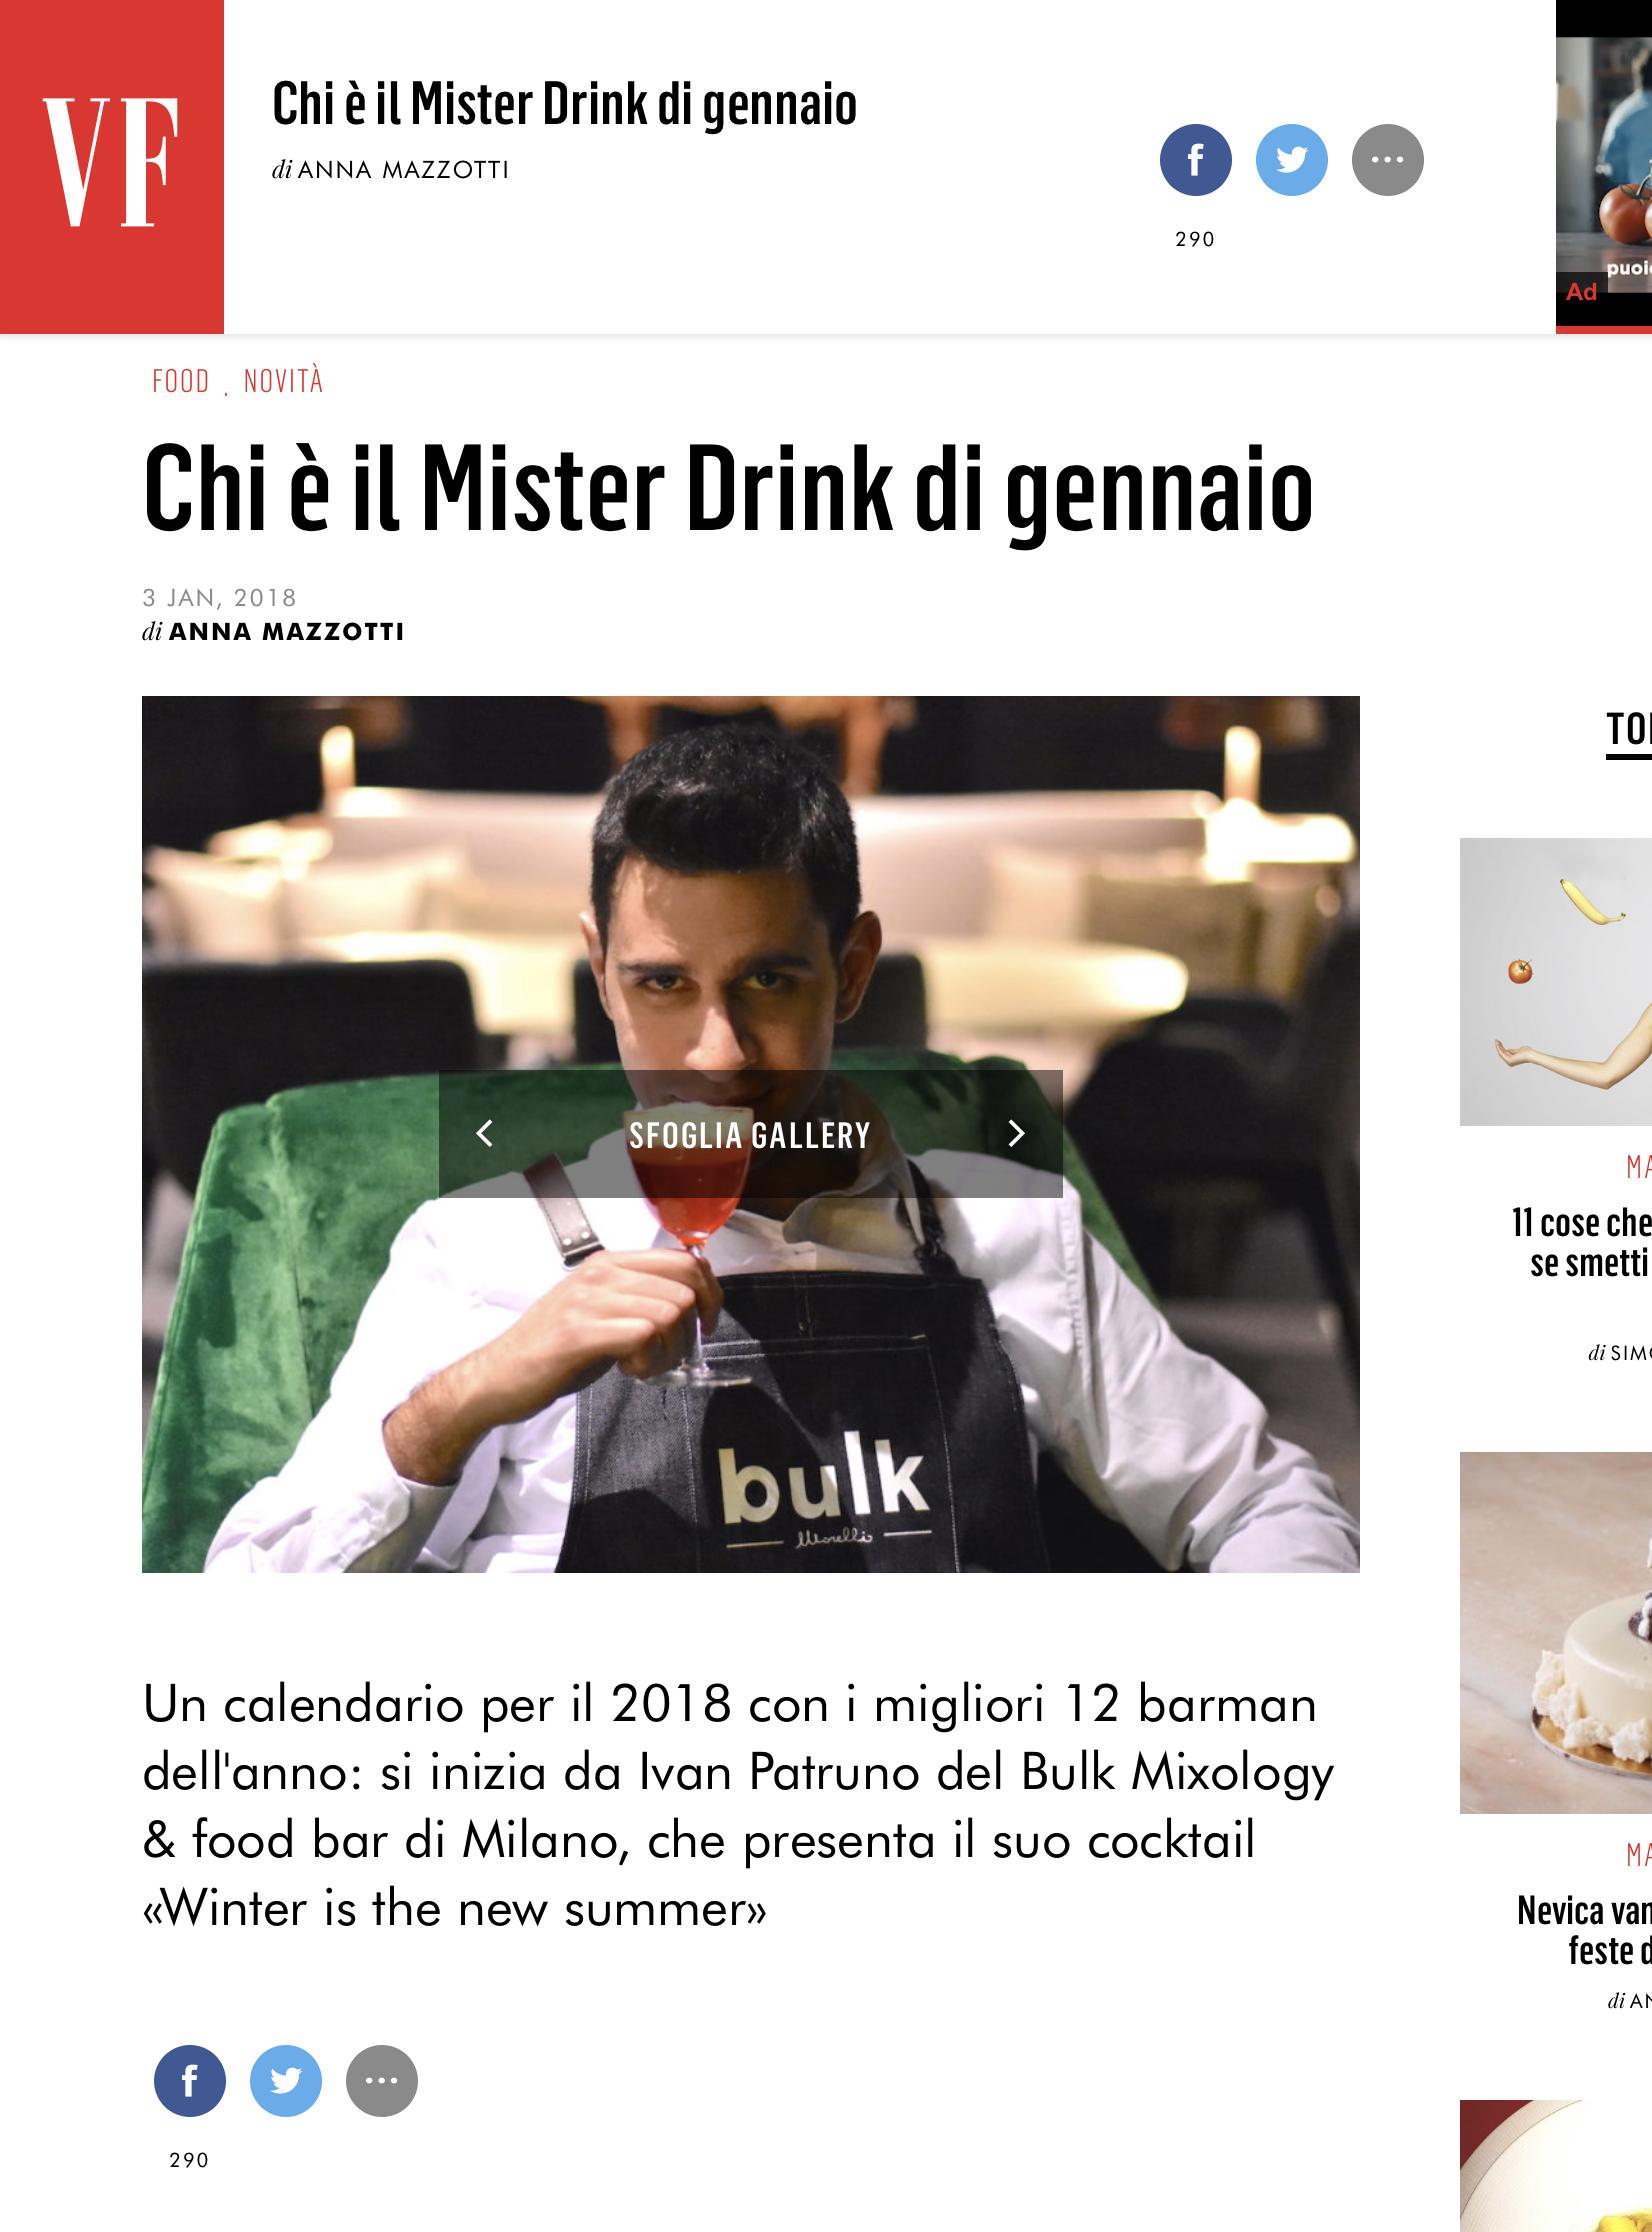 Mister drink di gennaio bulk mixology food bar